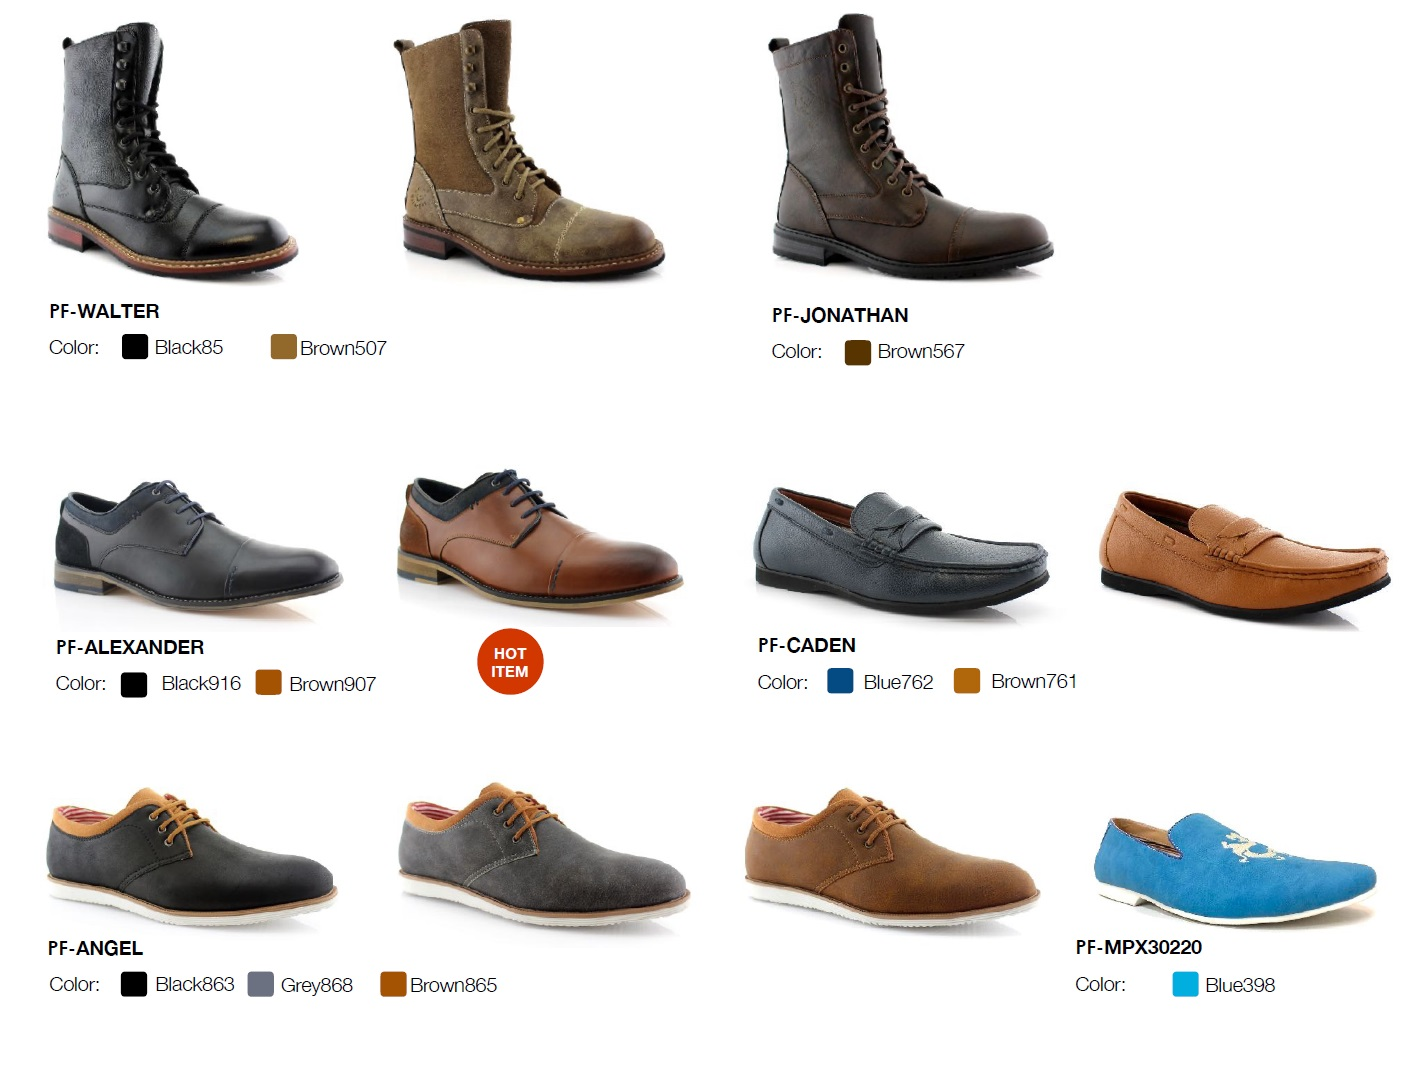 Nantlis Vol 43 Zapatos para Hombres Mayoreo Wholesale men shoes Catalogo Polar Fox Footwear_Page_11